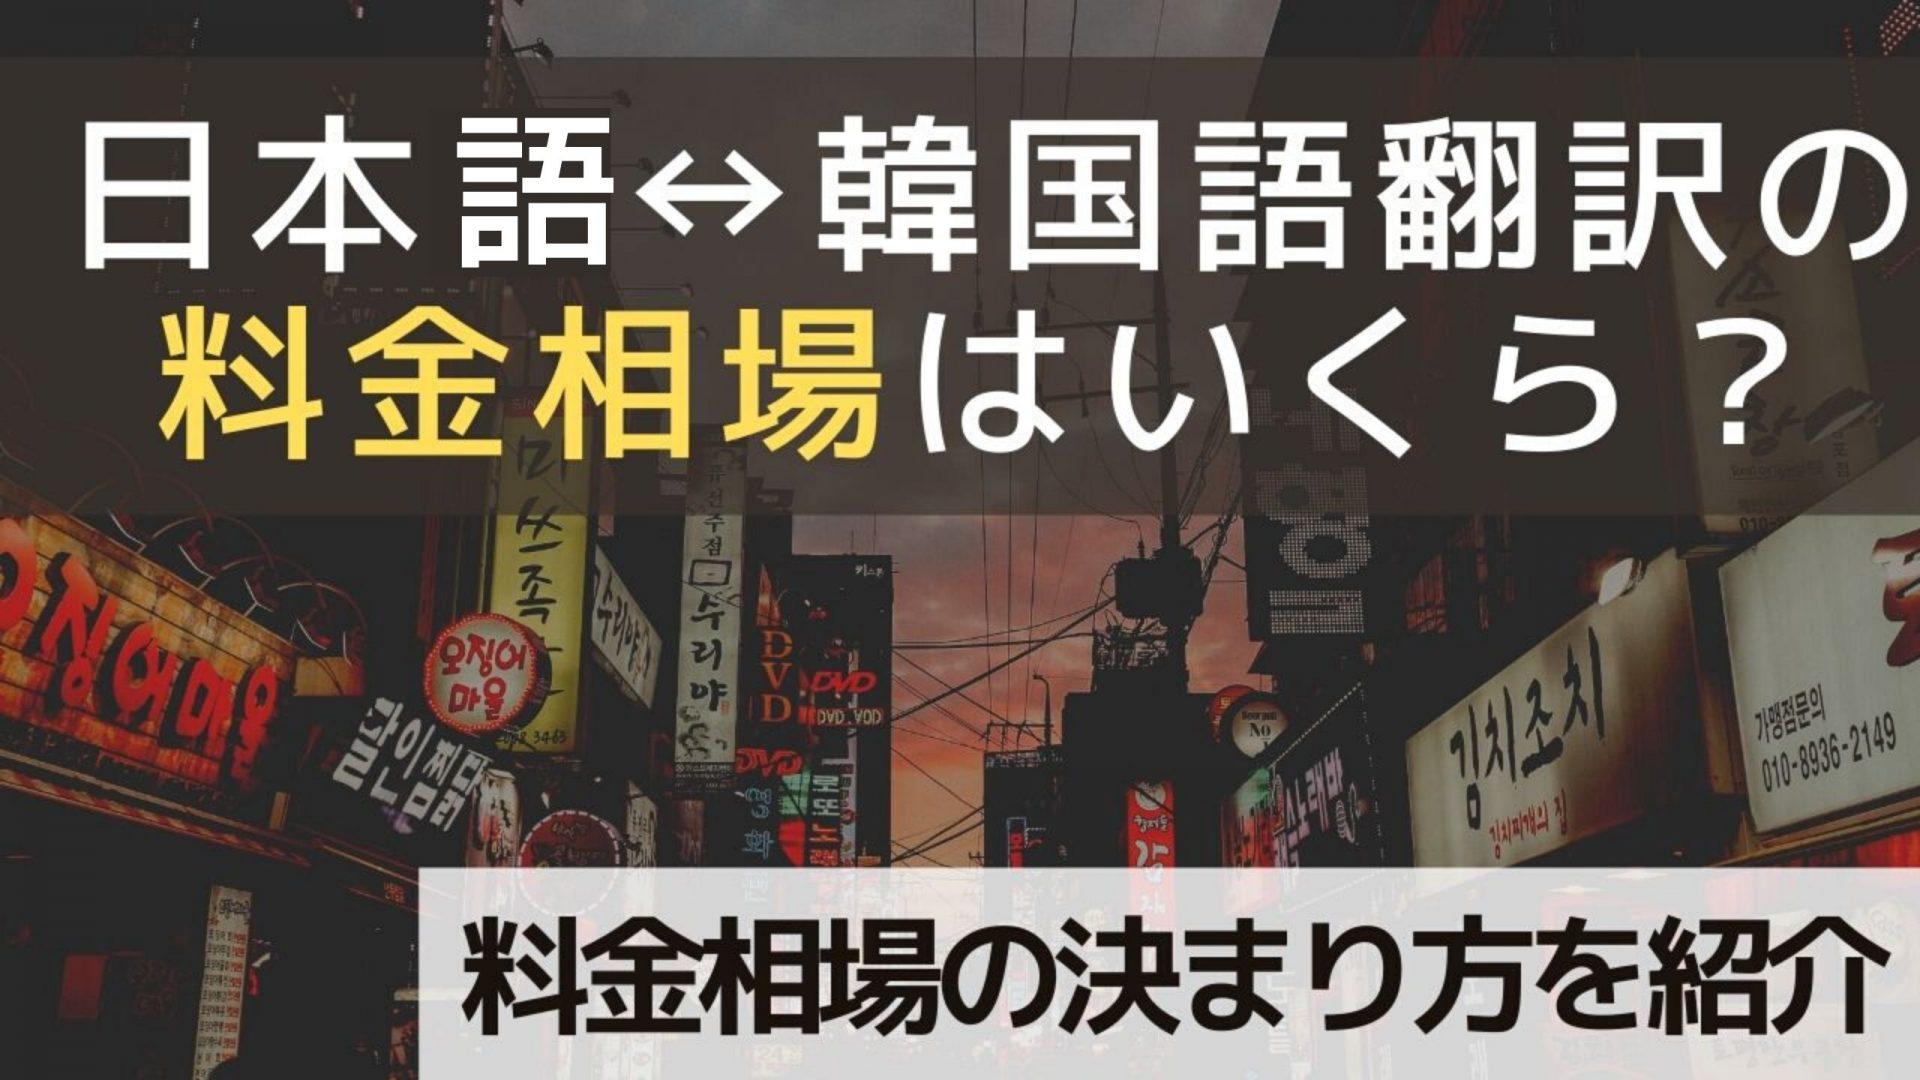 5f63f383a030c8d711bea8756bc74d31 - 日本語から韓国語、韓国語から日本語への翻訳料金の相場は?